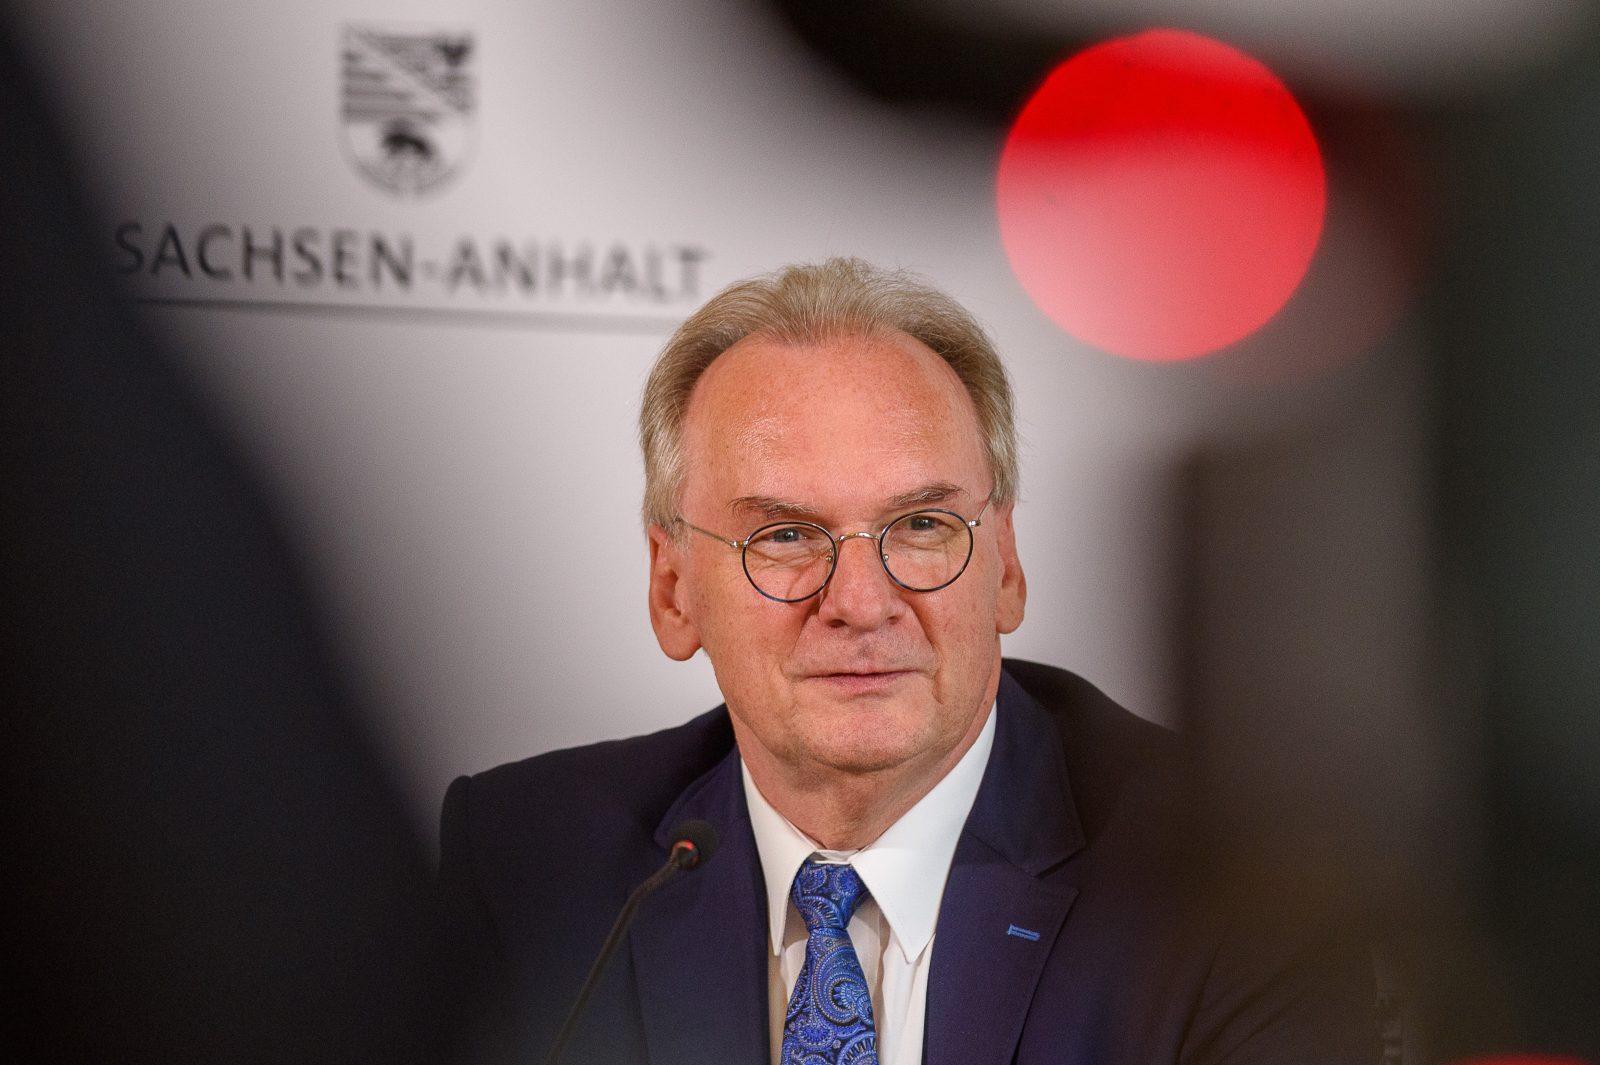 Sachsen-Anhalts Ministerpräsident Reiner Haseloff (CDU) in Magdeburg: Fauler Kompromiß